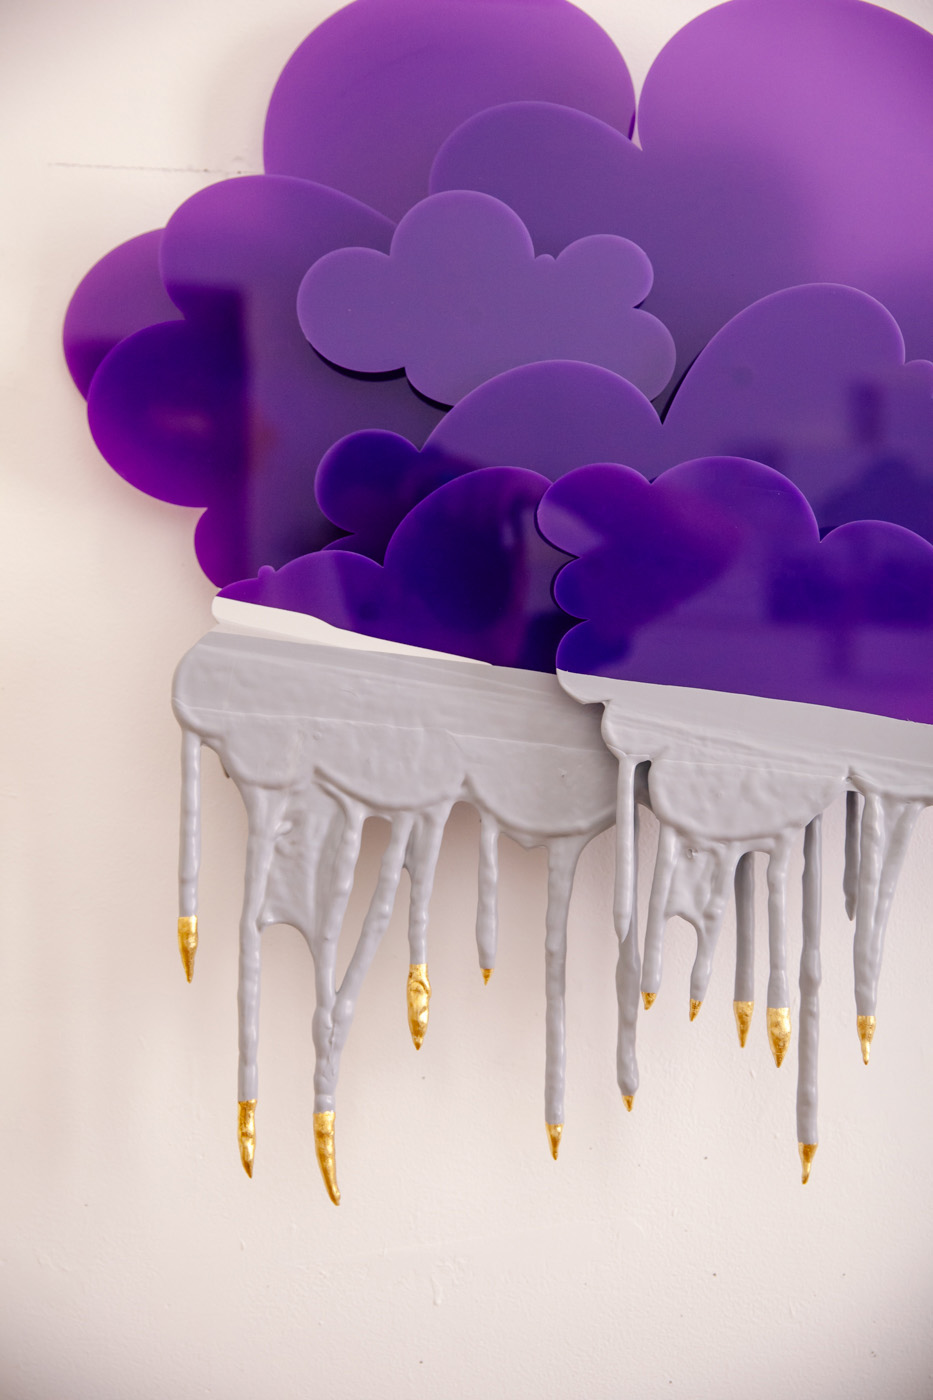 Rain Cloud #1